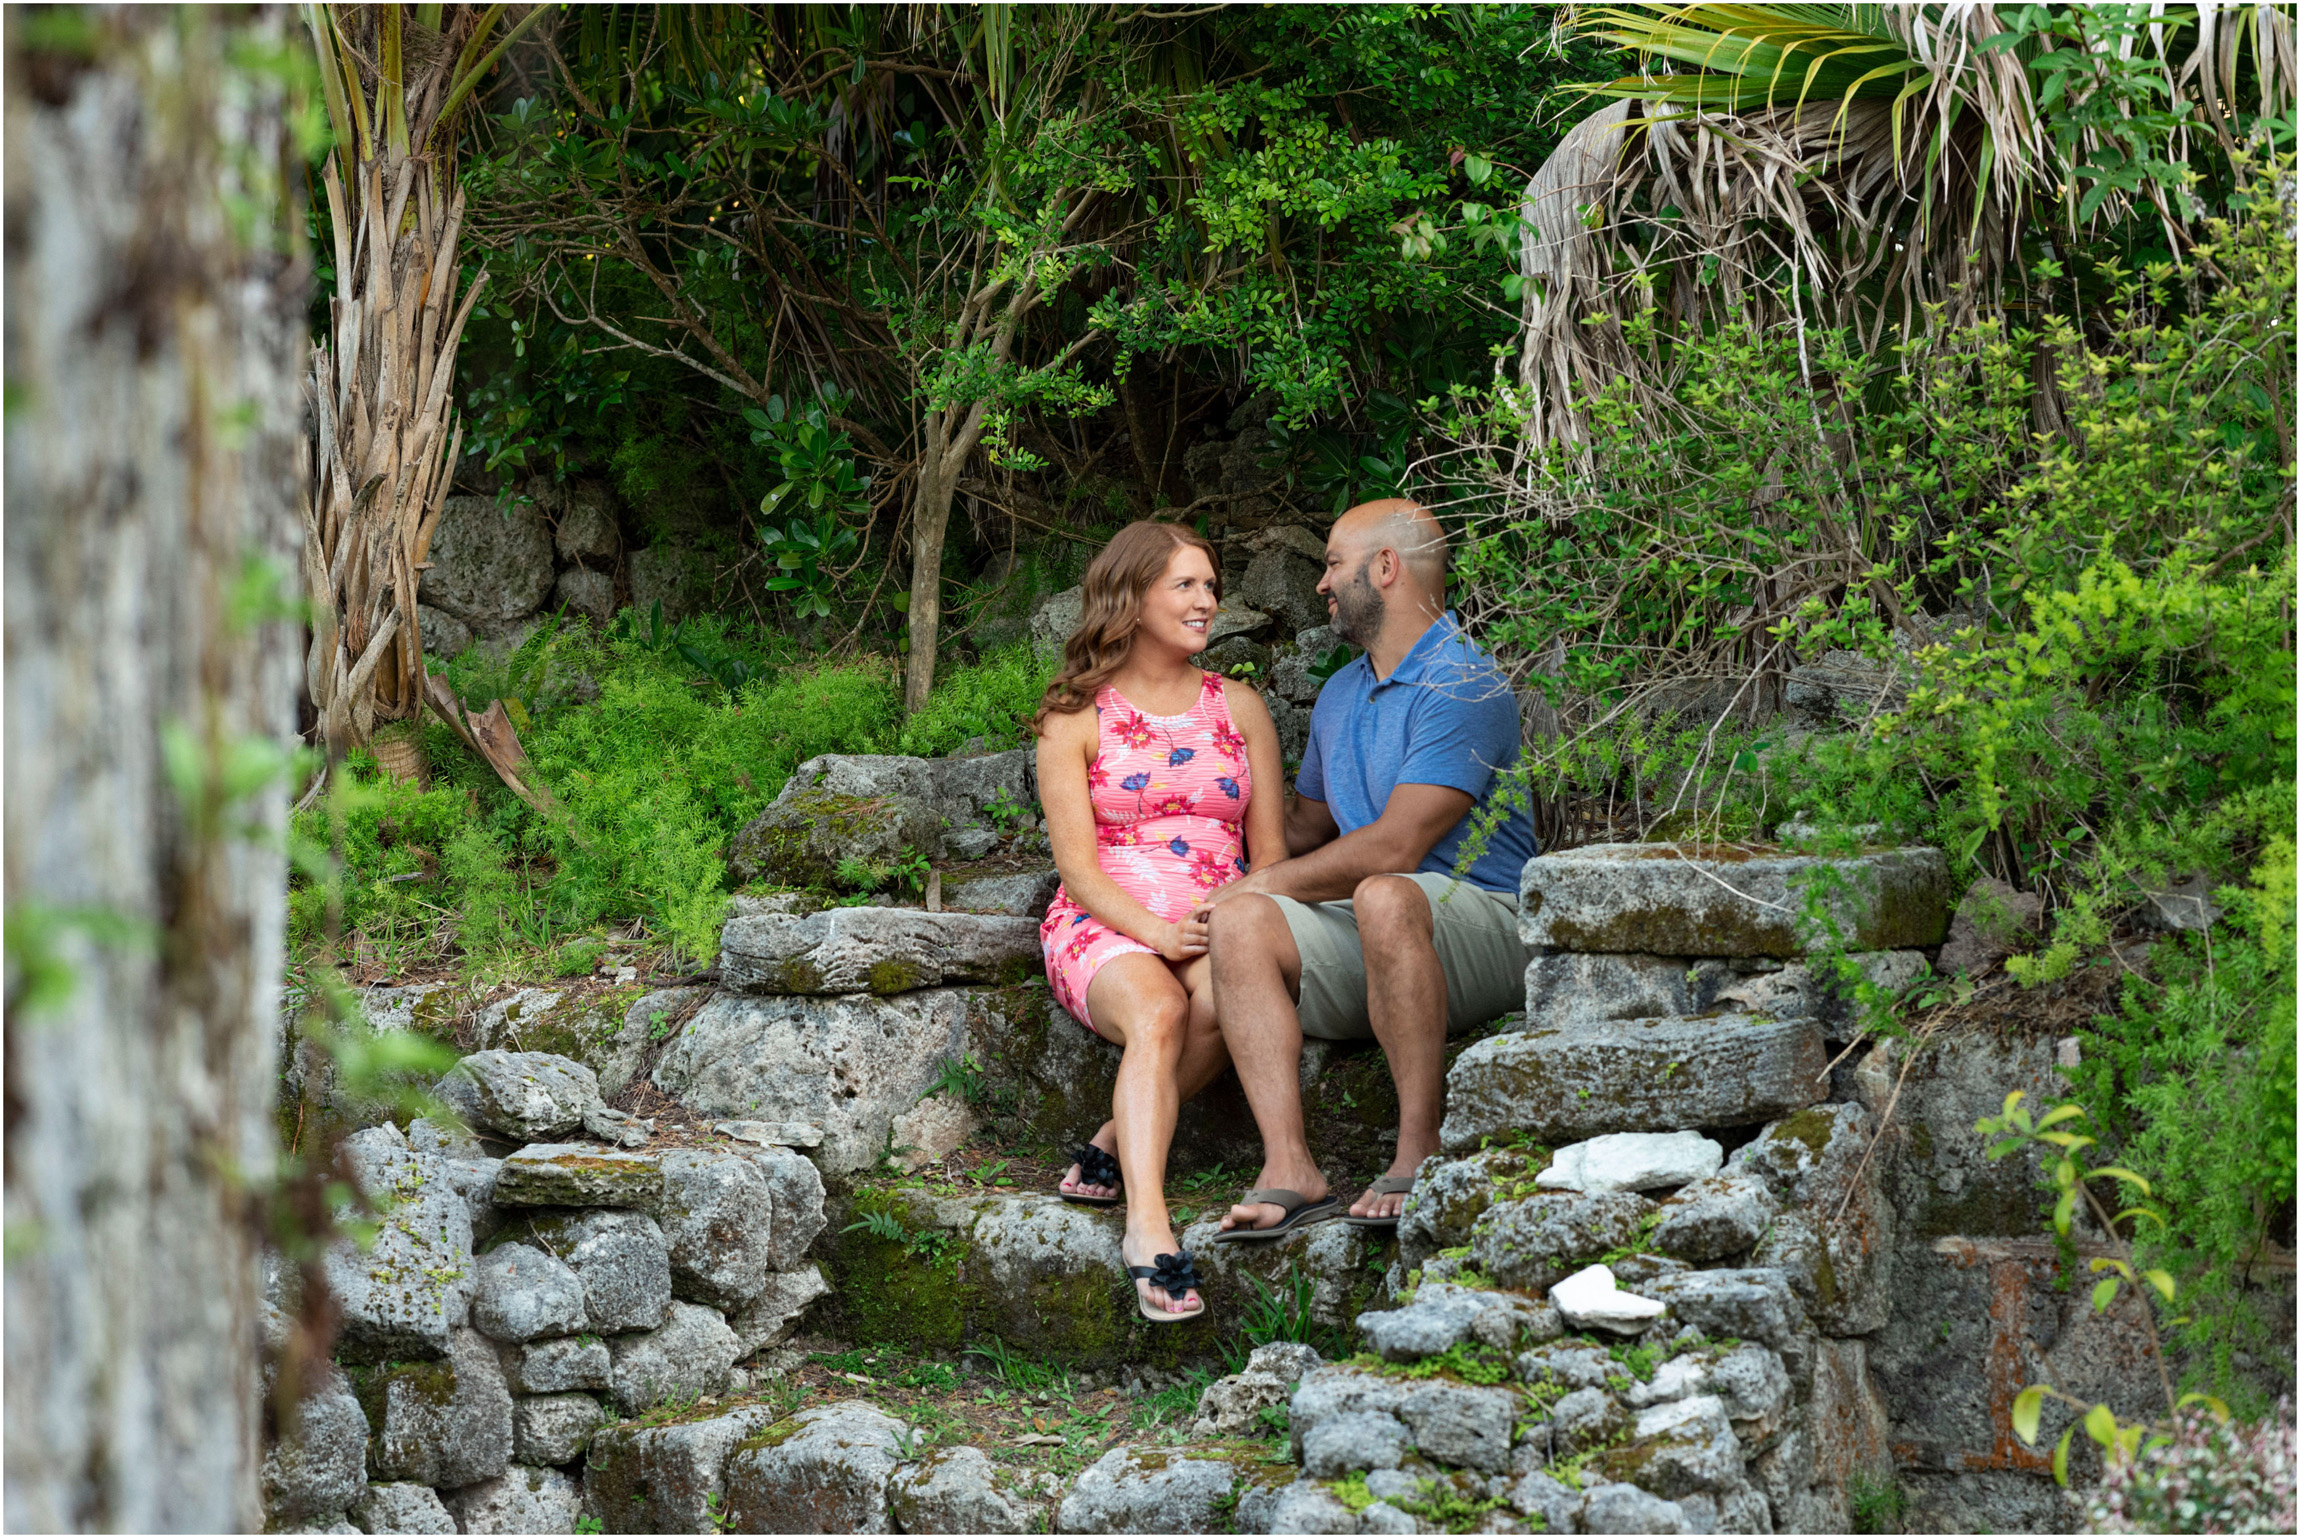 ©FianderFoto_Bermuda Maternity Photographer_Elys Harbour_Ft Scaur_Airbnb_Victoria_Mike_013.jpg